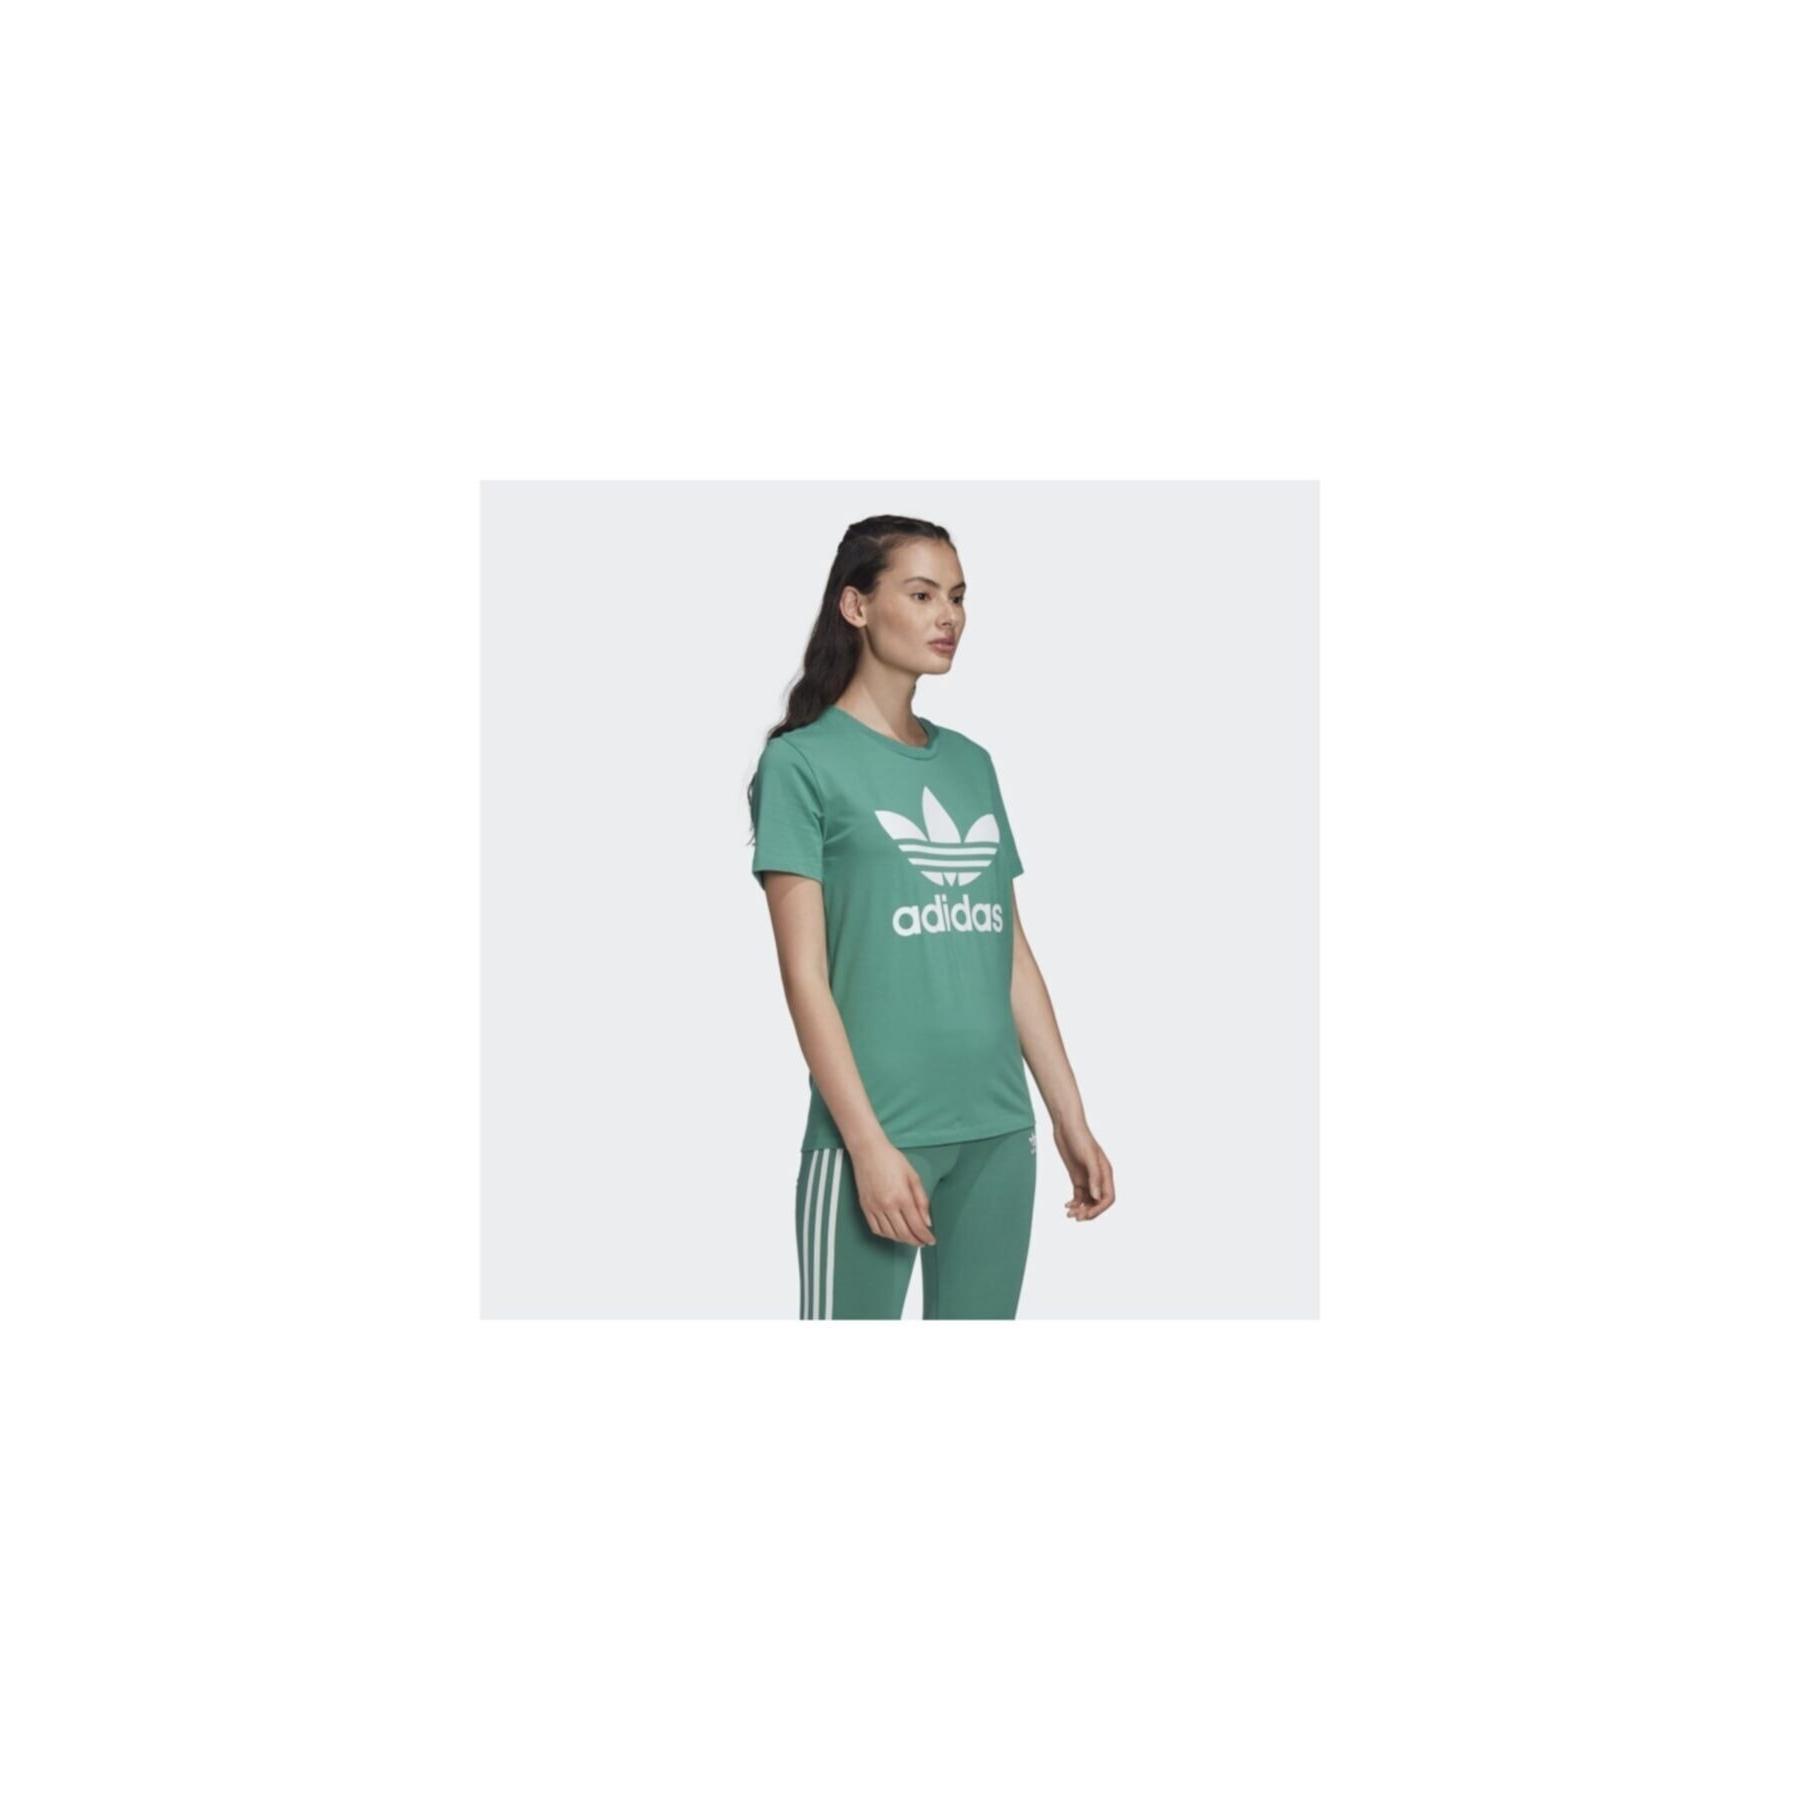 adidas Trefoil Kadın Yeşil Tişört (FM3300)